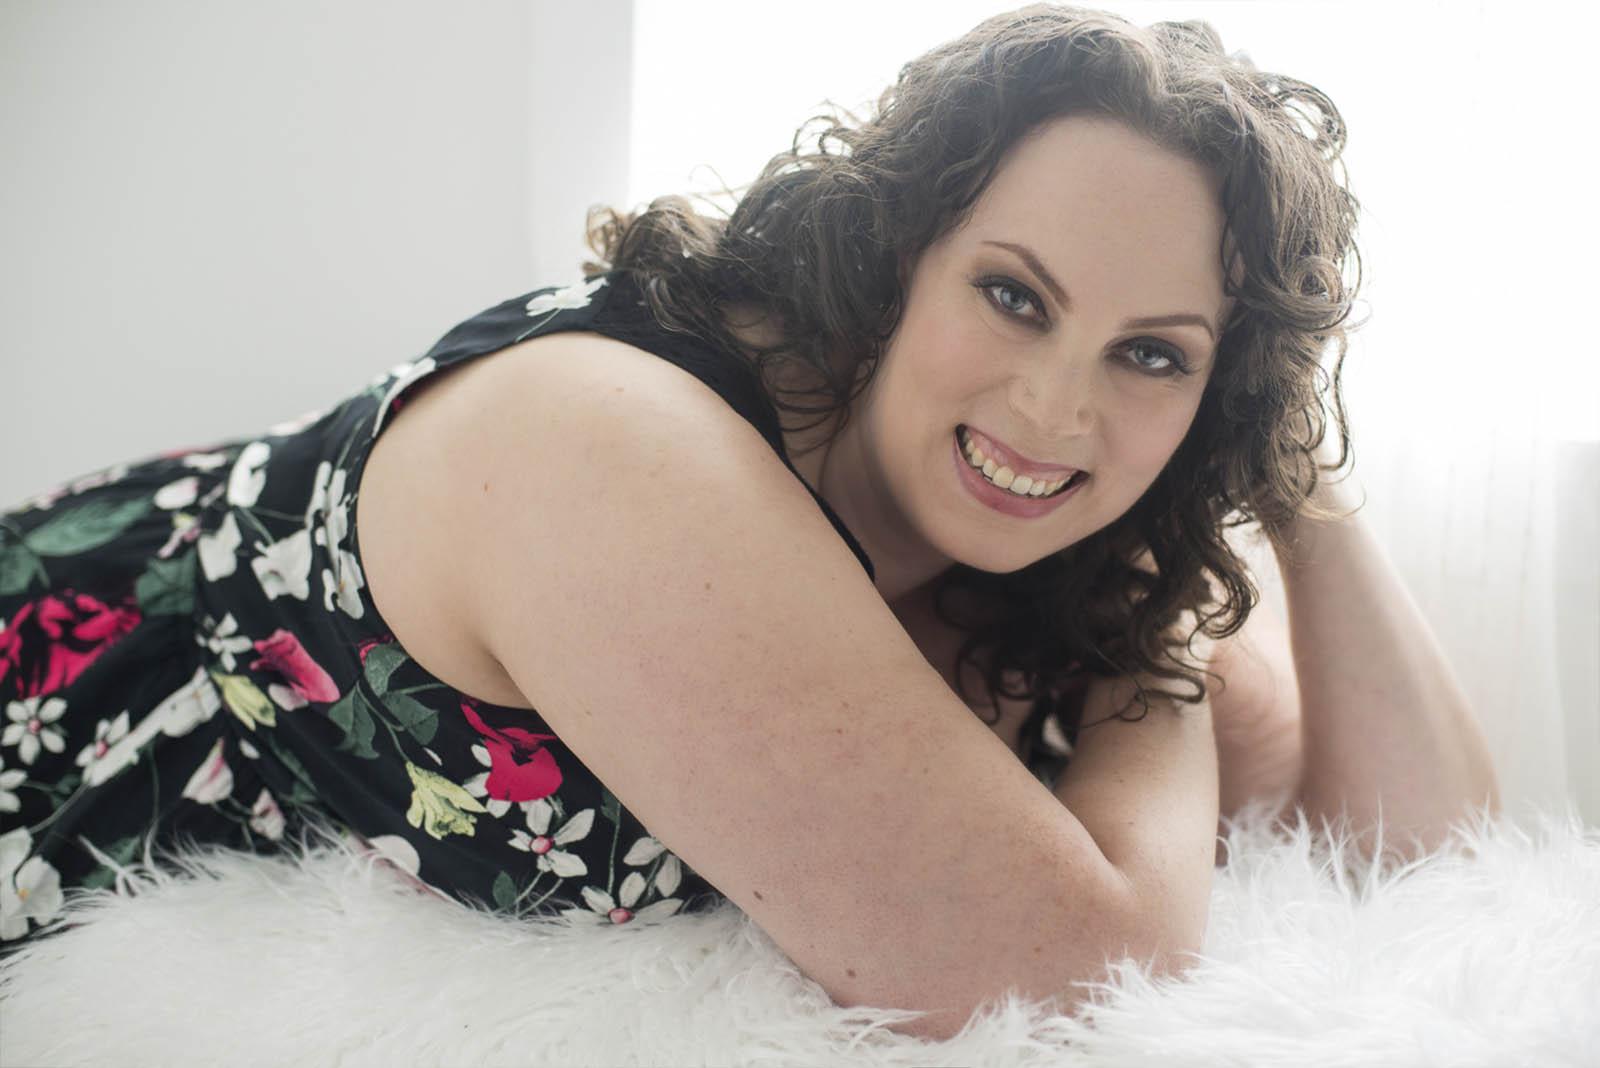 Chelsey Luren Portraits - Eating Disorder Recovery Photoshoot   Nicole Testimonial11.jpg